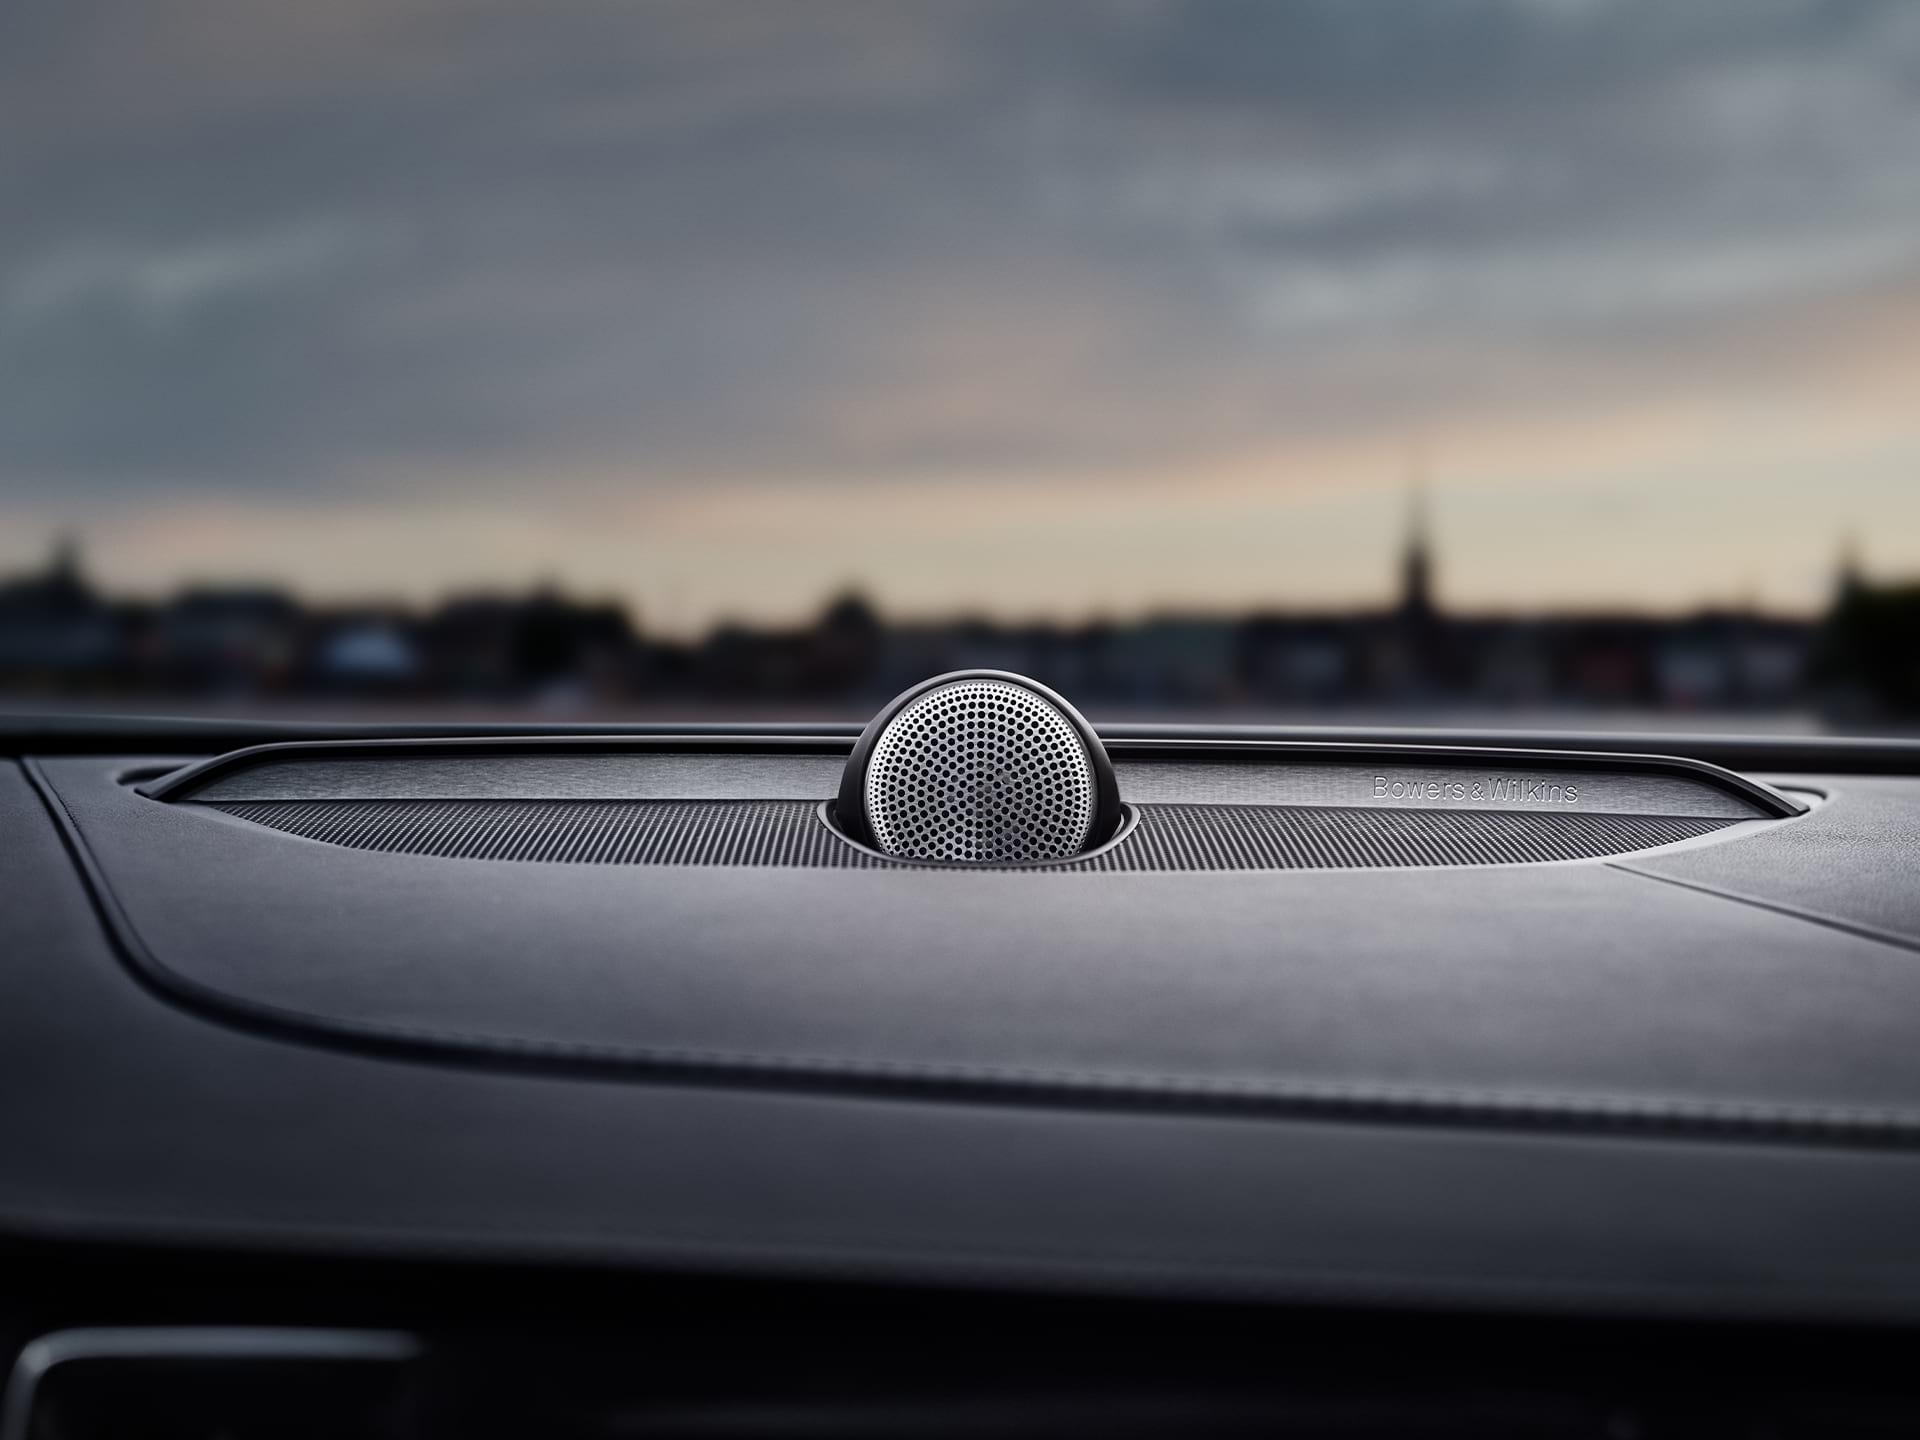 Bowers & Wilkins speakers inside a Volvo S90.